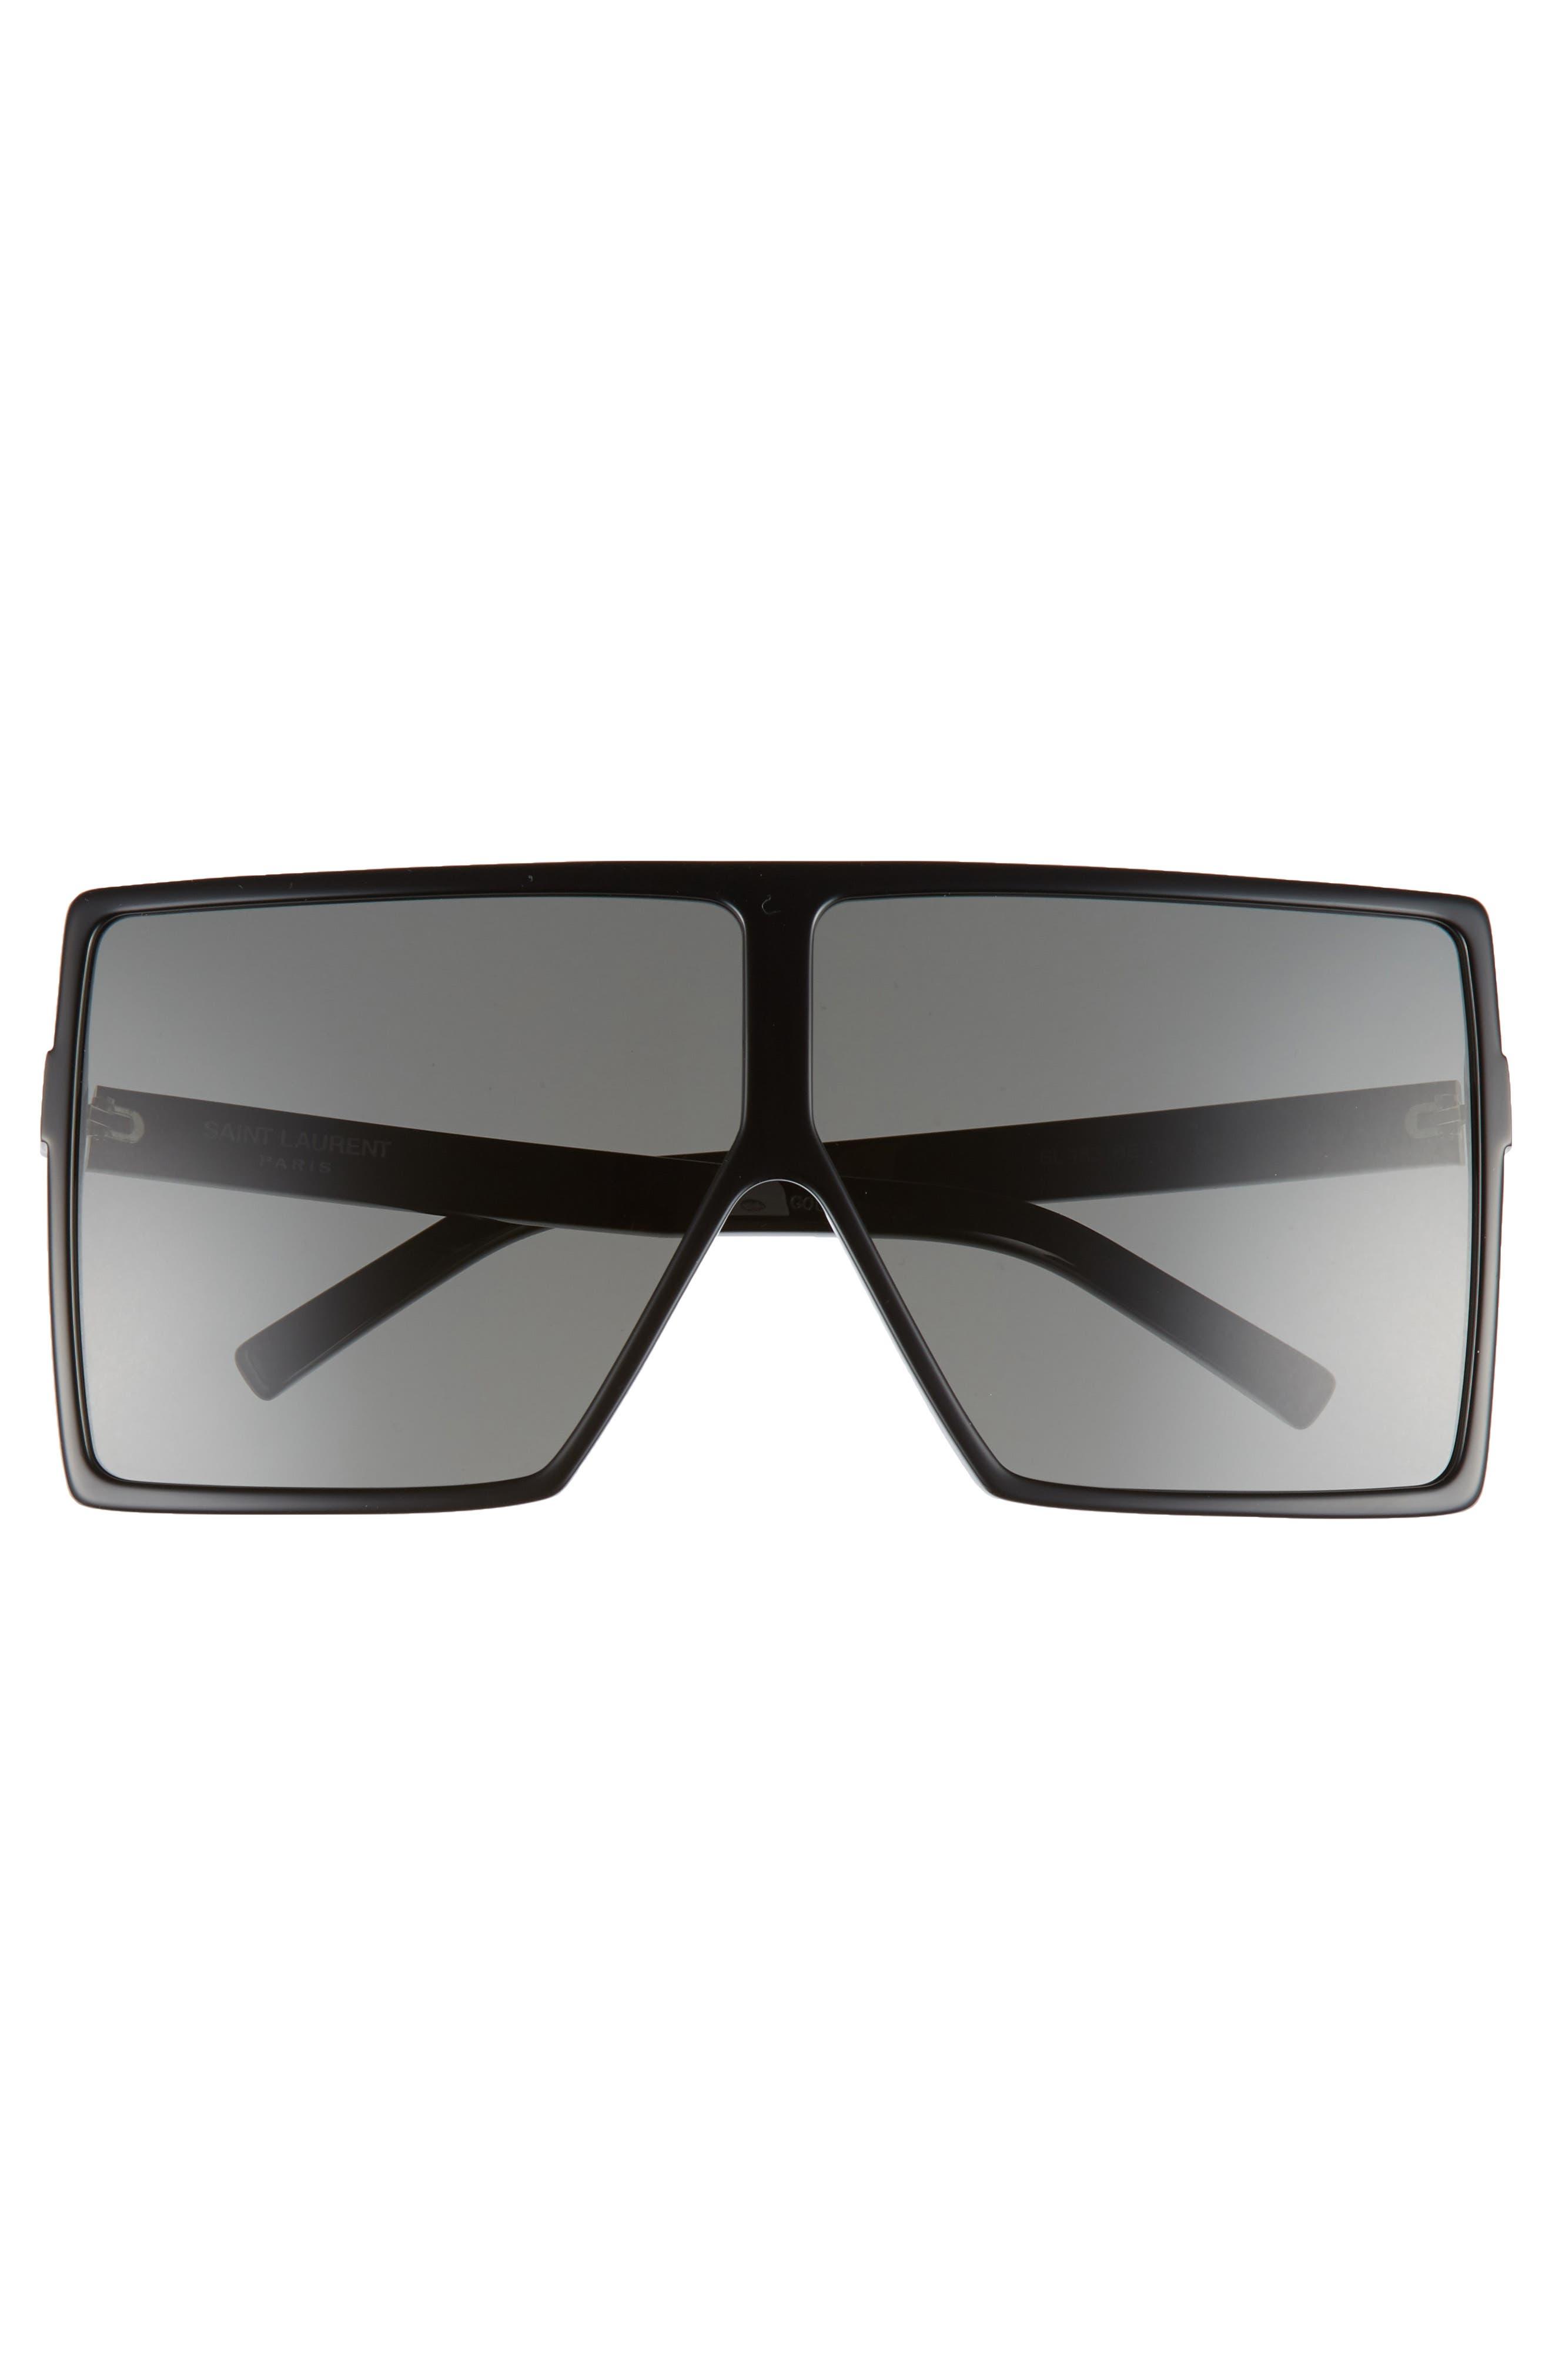 68mm Oversize Square Sunglasses,                             Alternate thumbnail 3, color,                             004